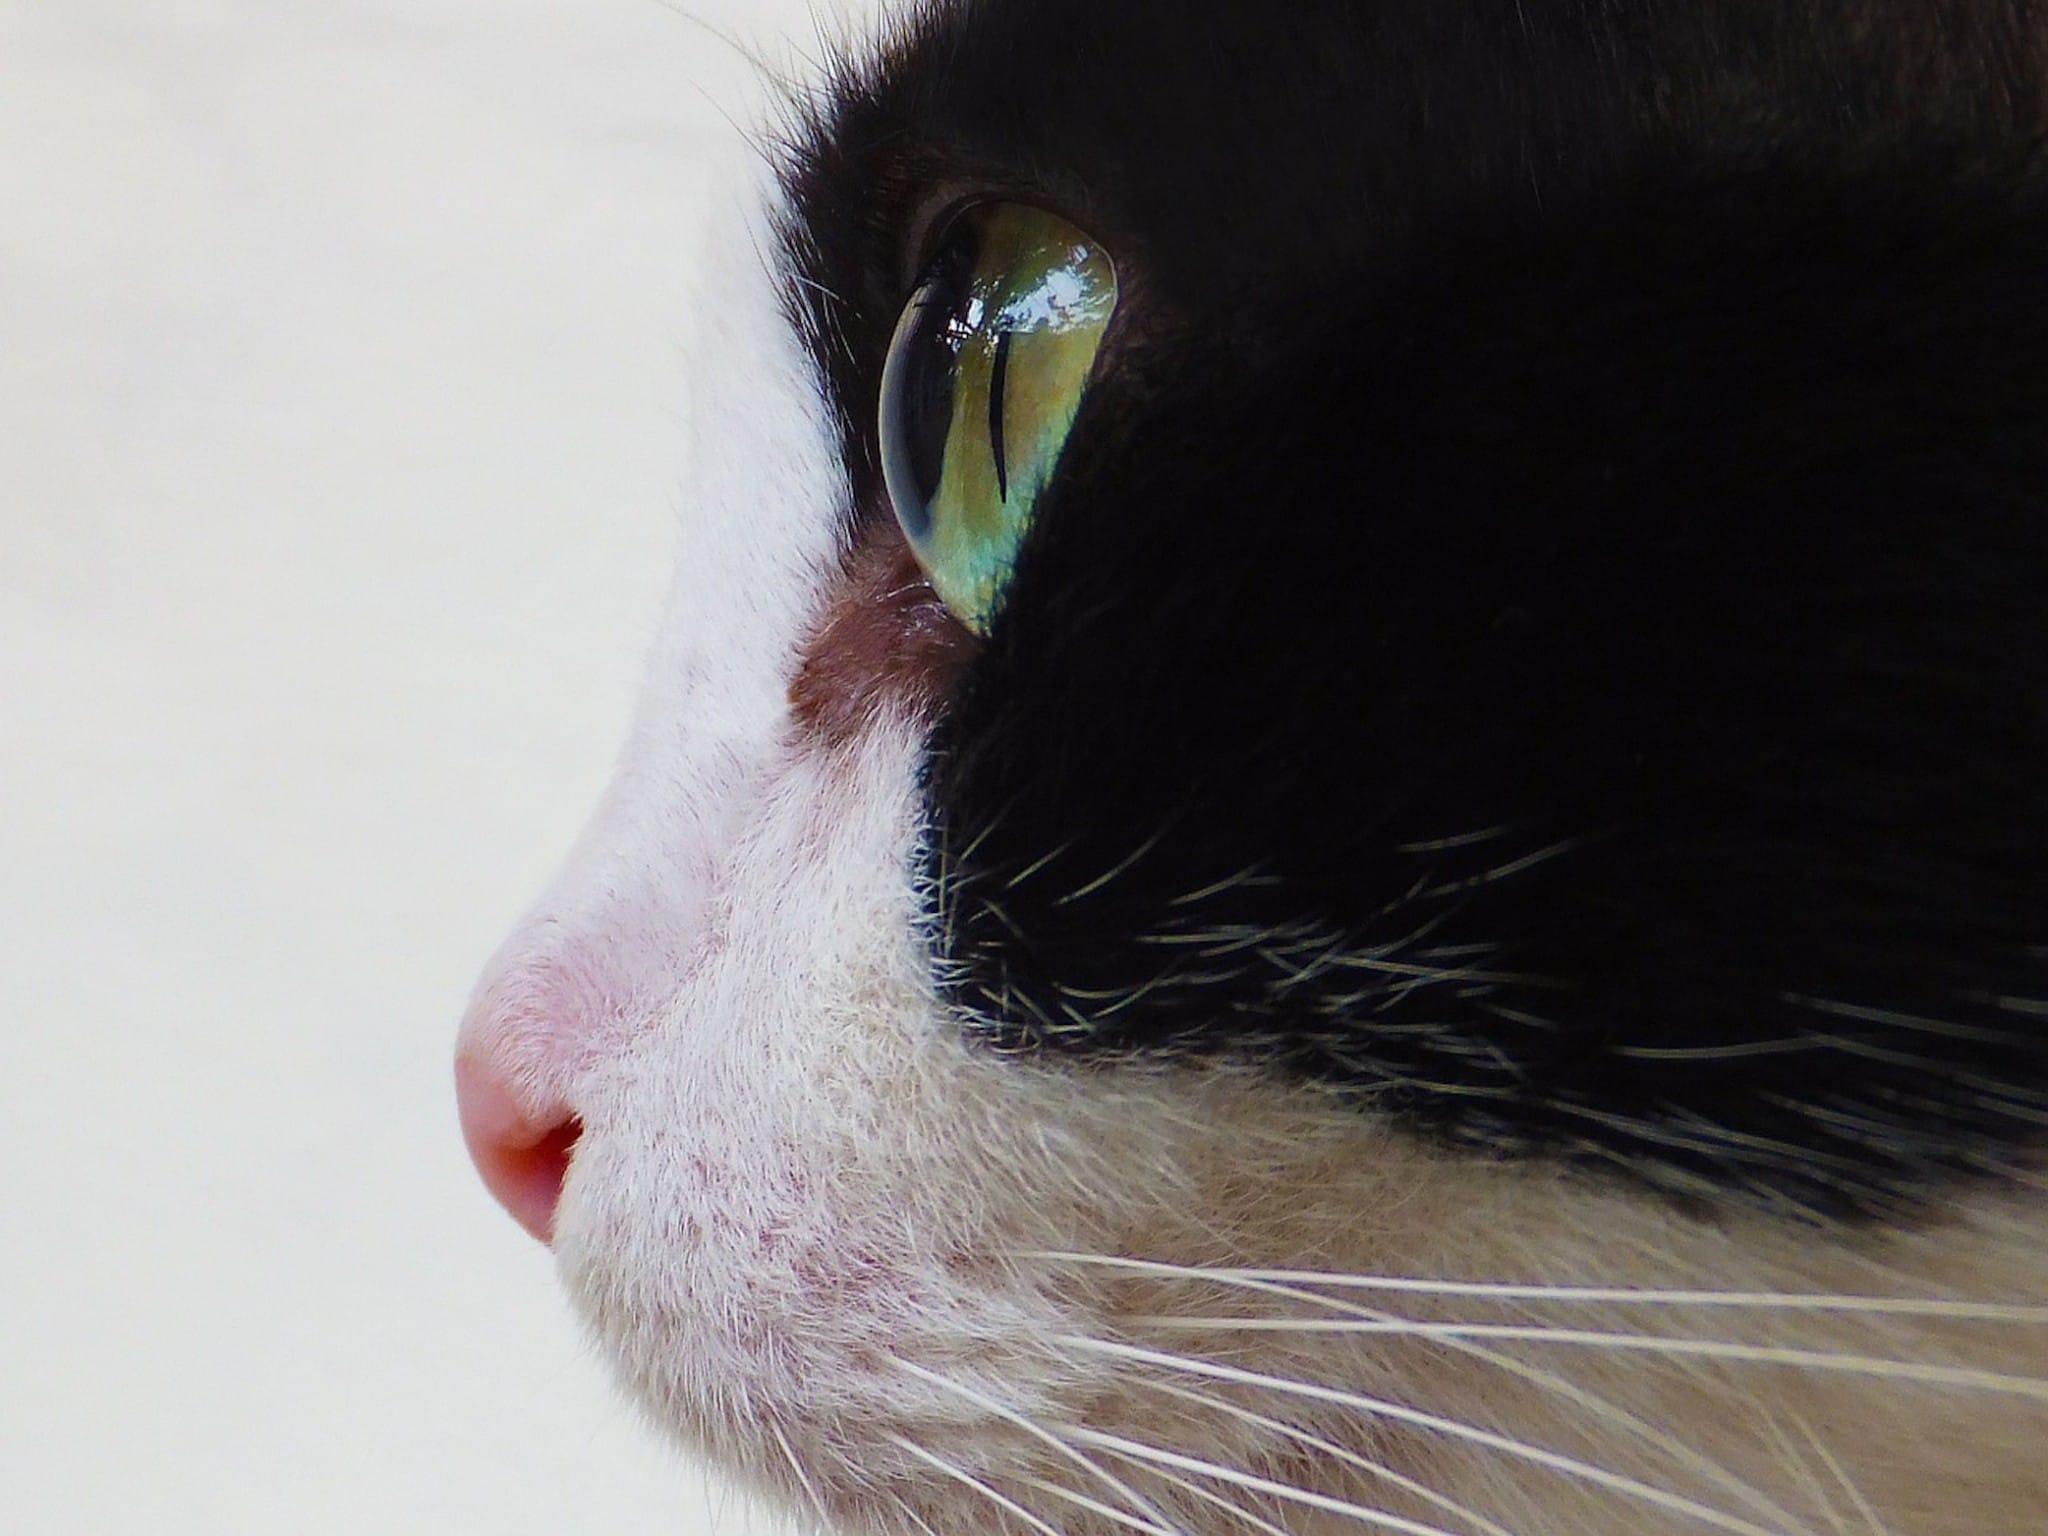 Cat Eye Profile Wallpaper   Free HD Cute Cats